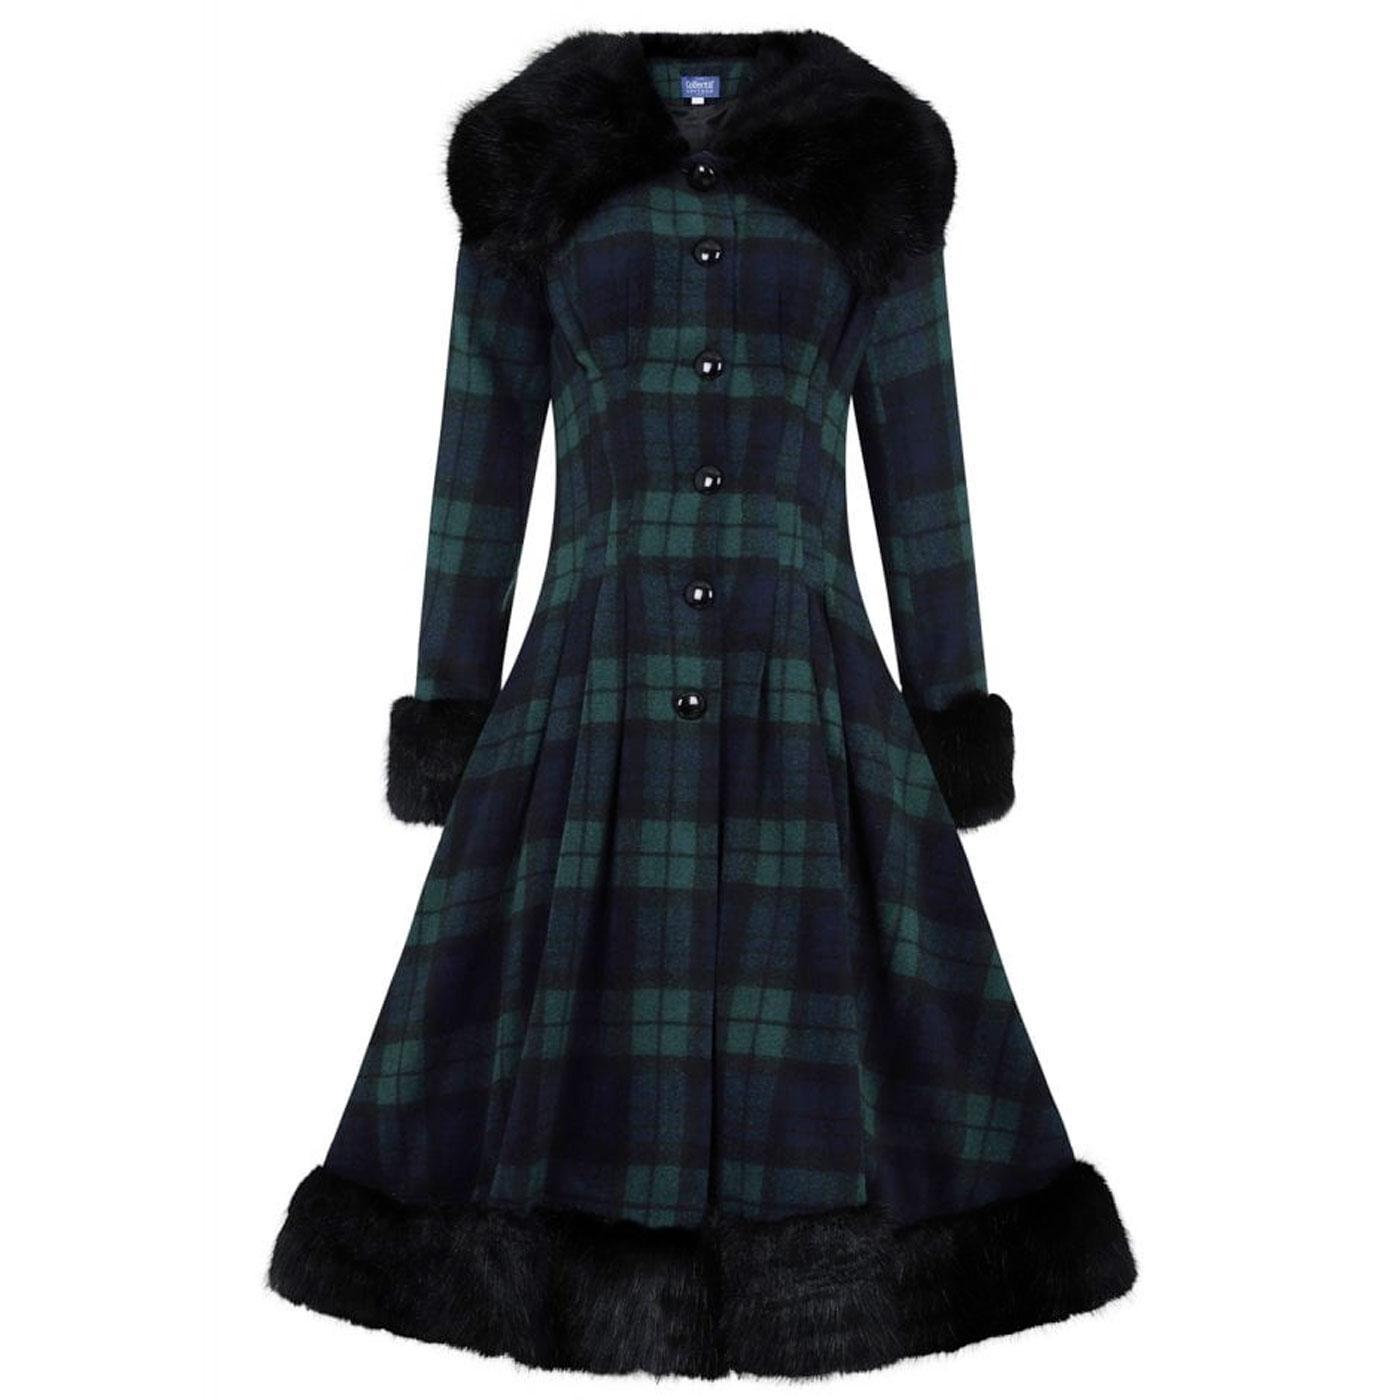 Pearl COLLECTIF Blackwatch Check Vintage Coat